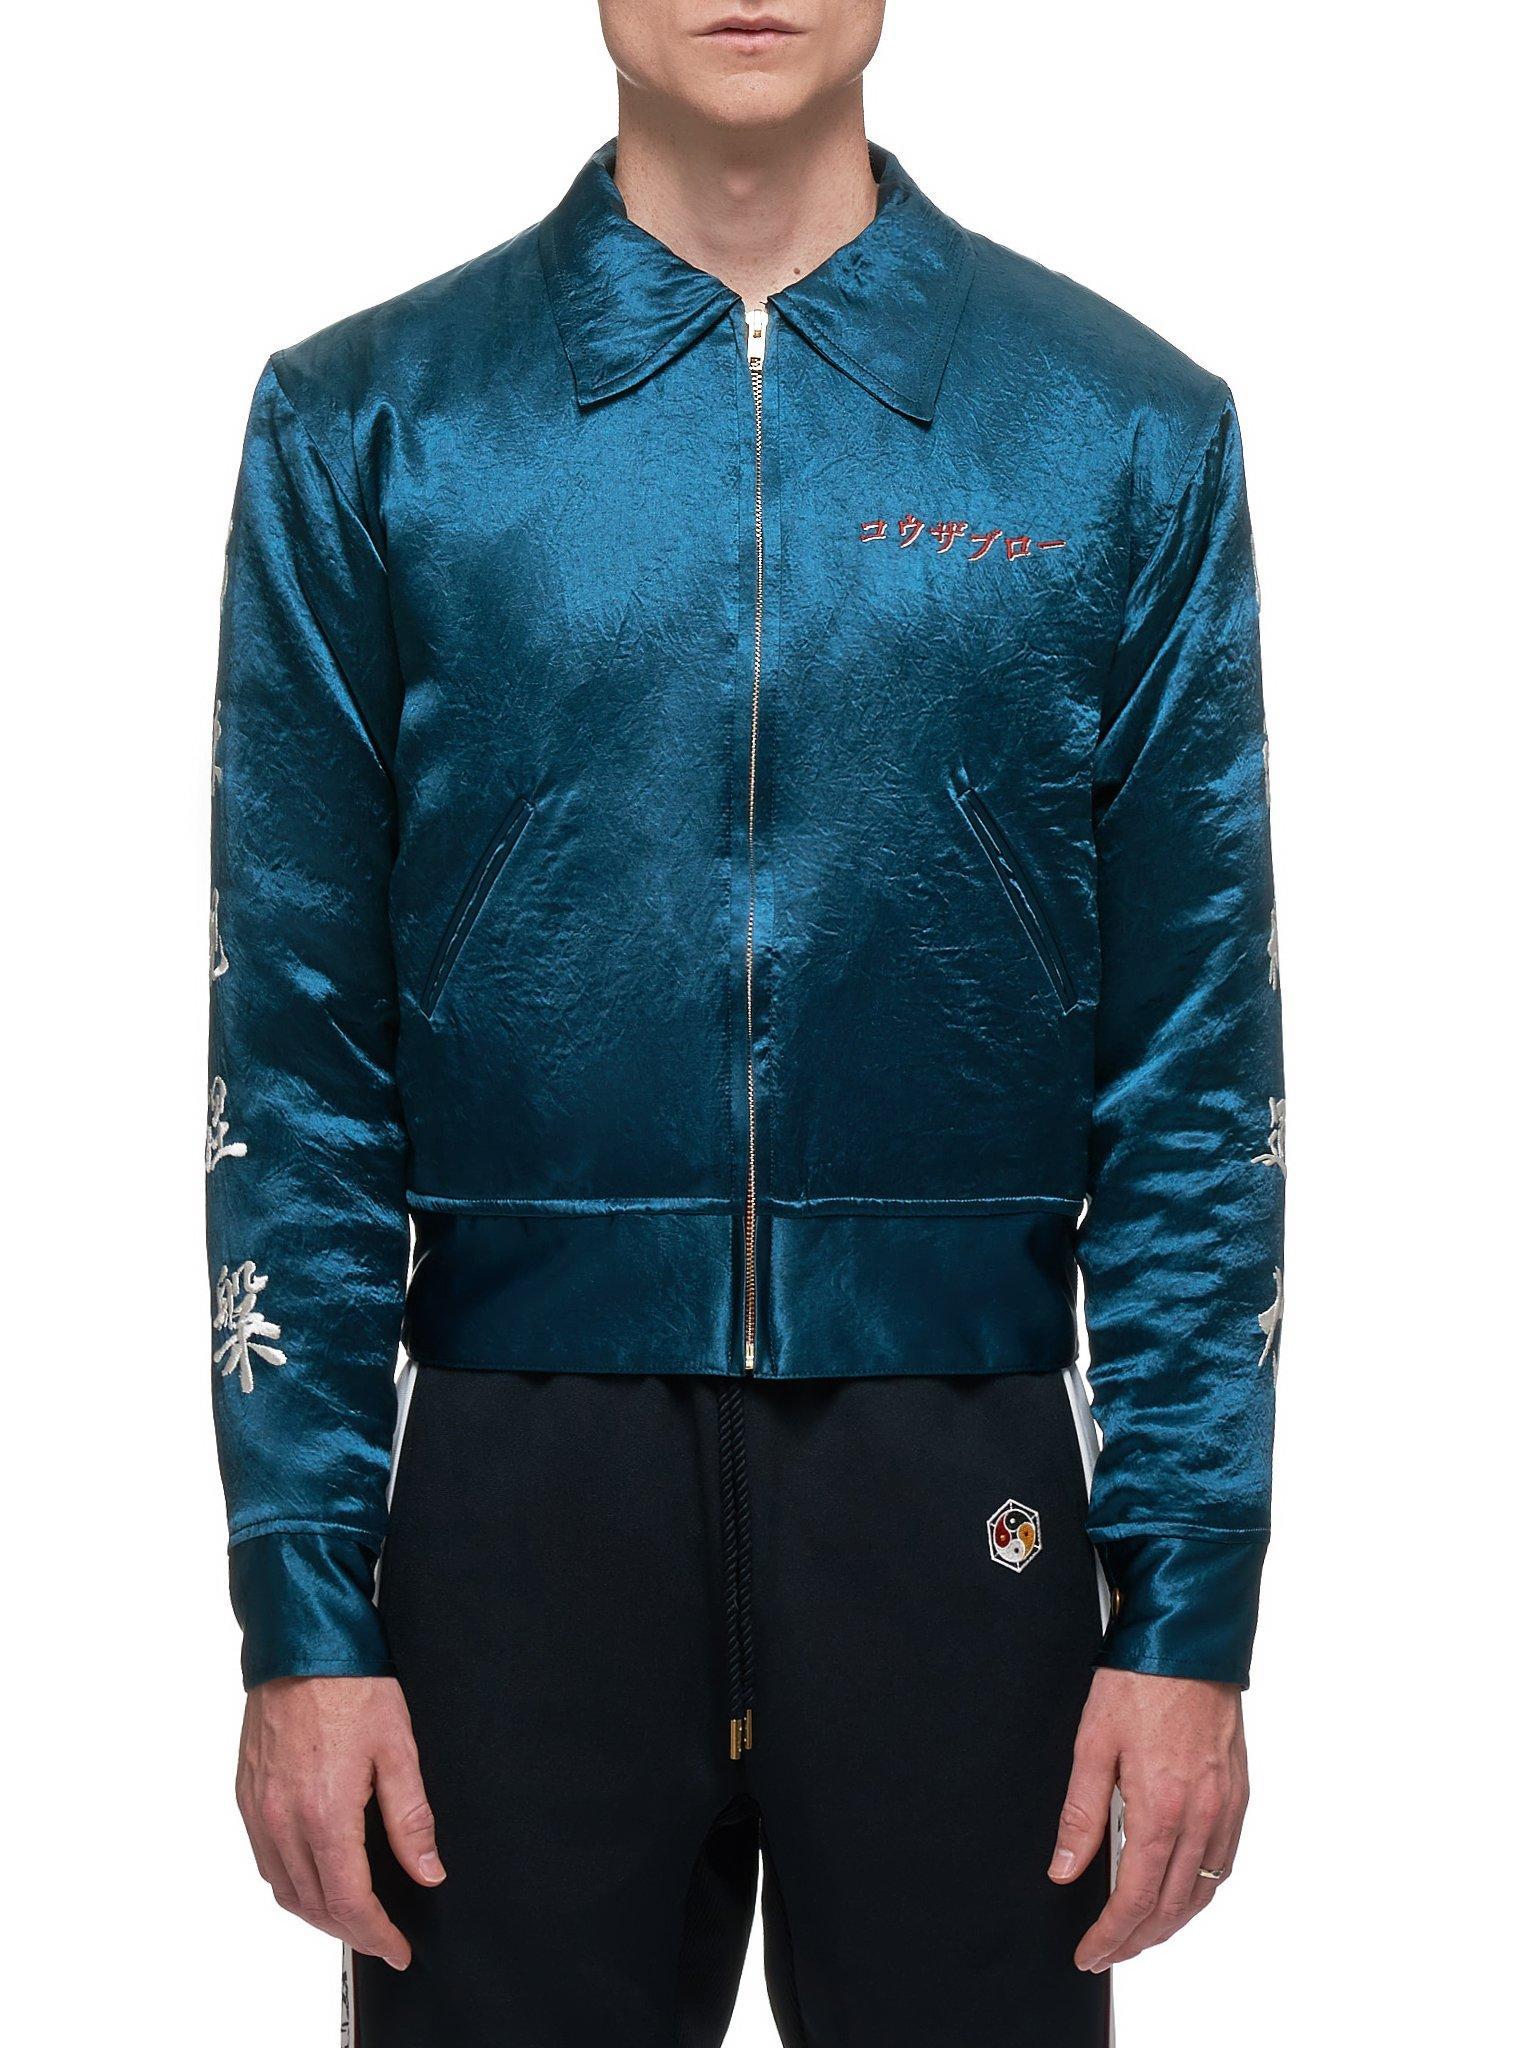 Kozaburo Broken Satin Souvenir Jacket In Green For Men Lyst